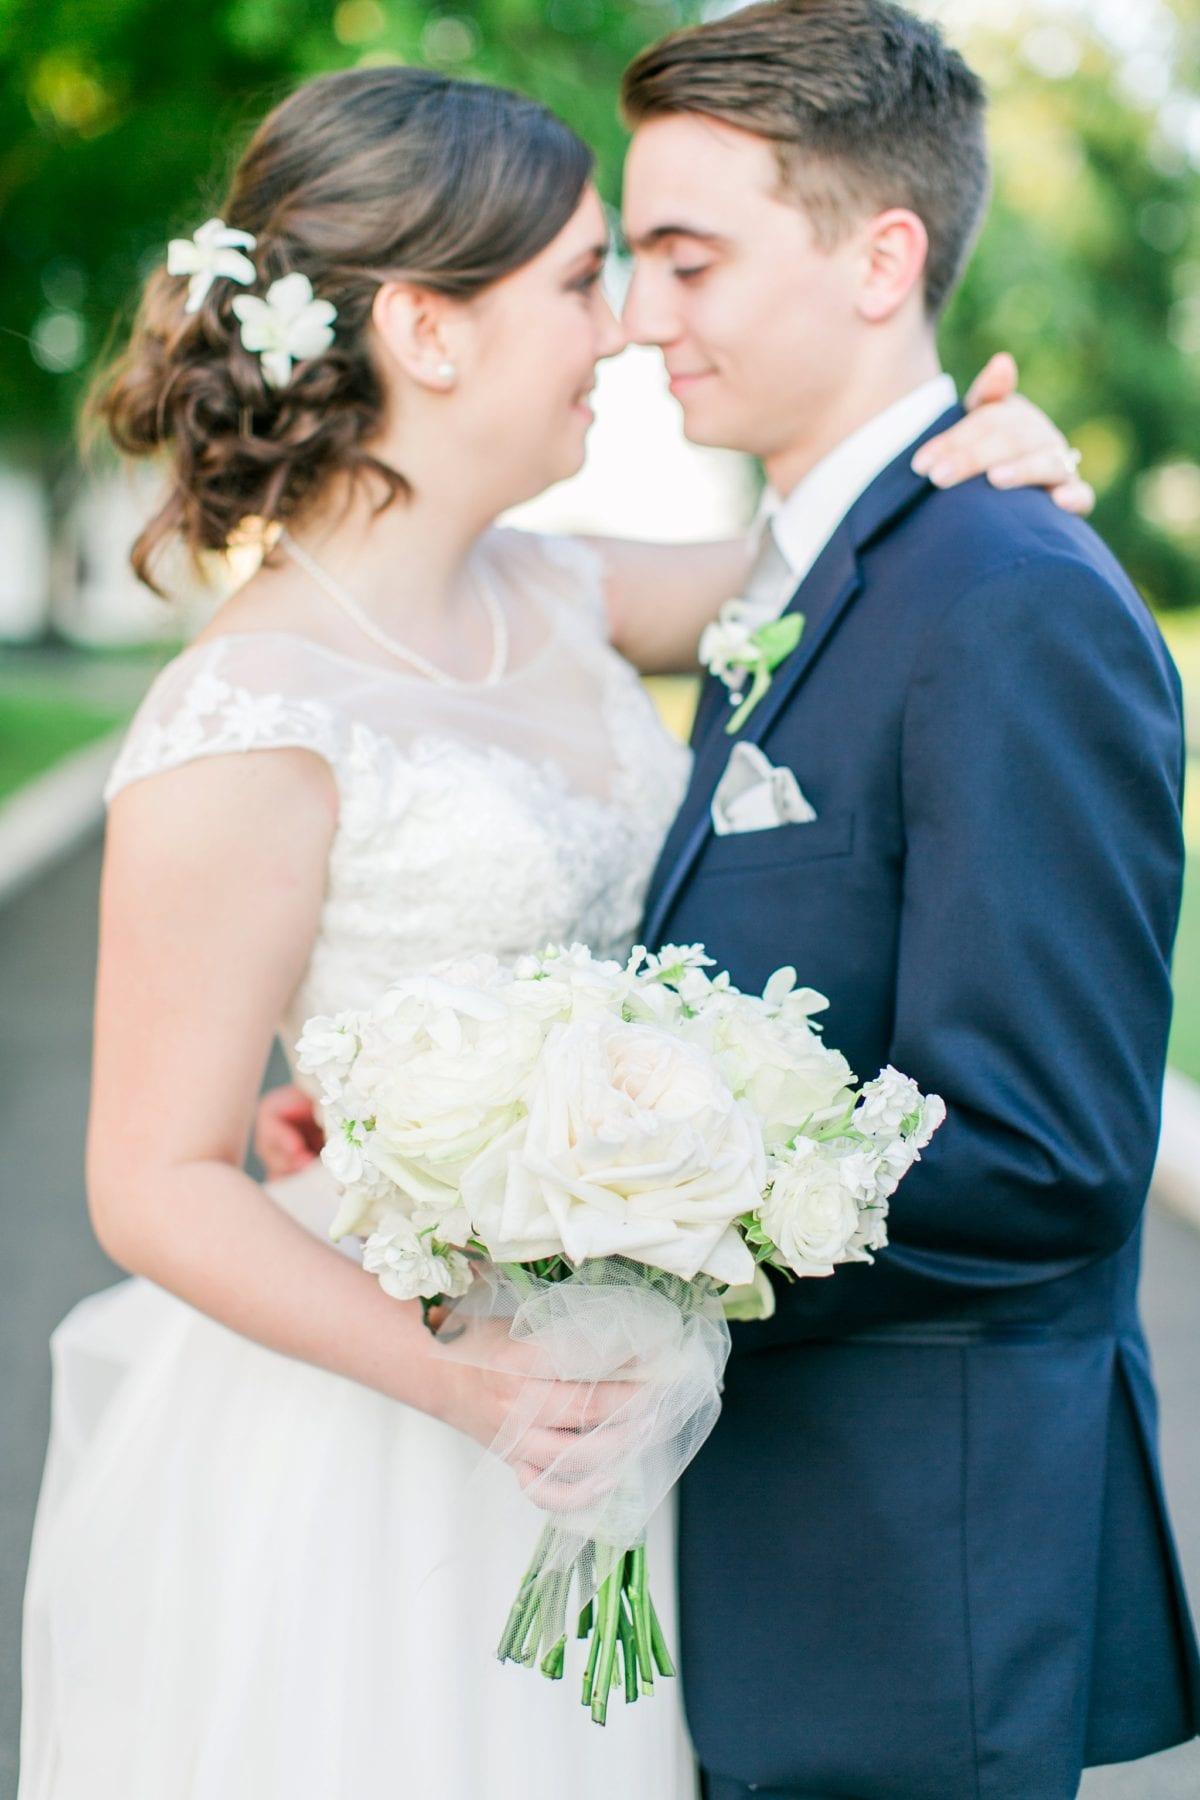 Bristow Manor Wedding Photos Virginia Wedding Photographer Lauren & Andrew Megan Kelsey Photography-540.jpg